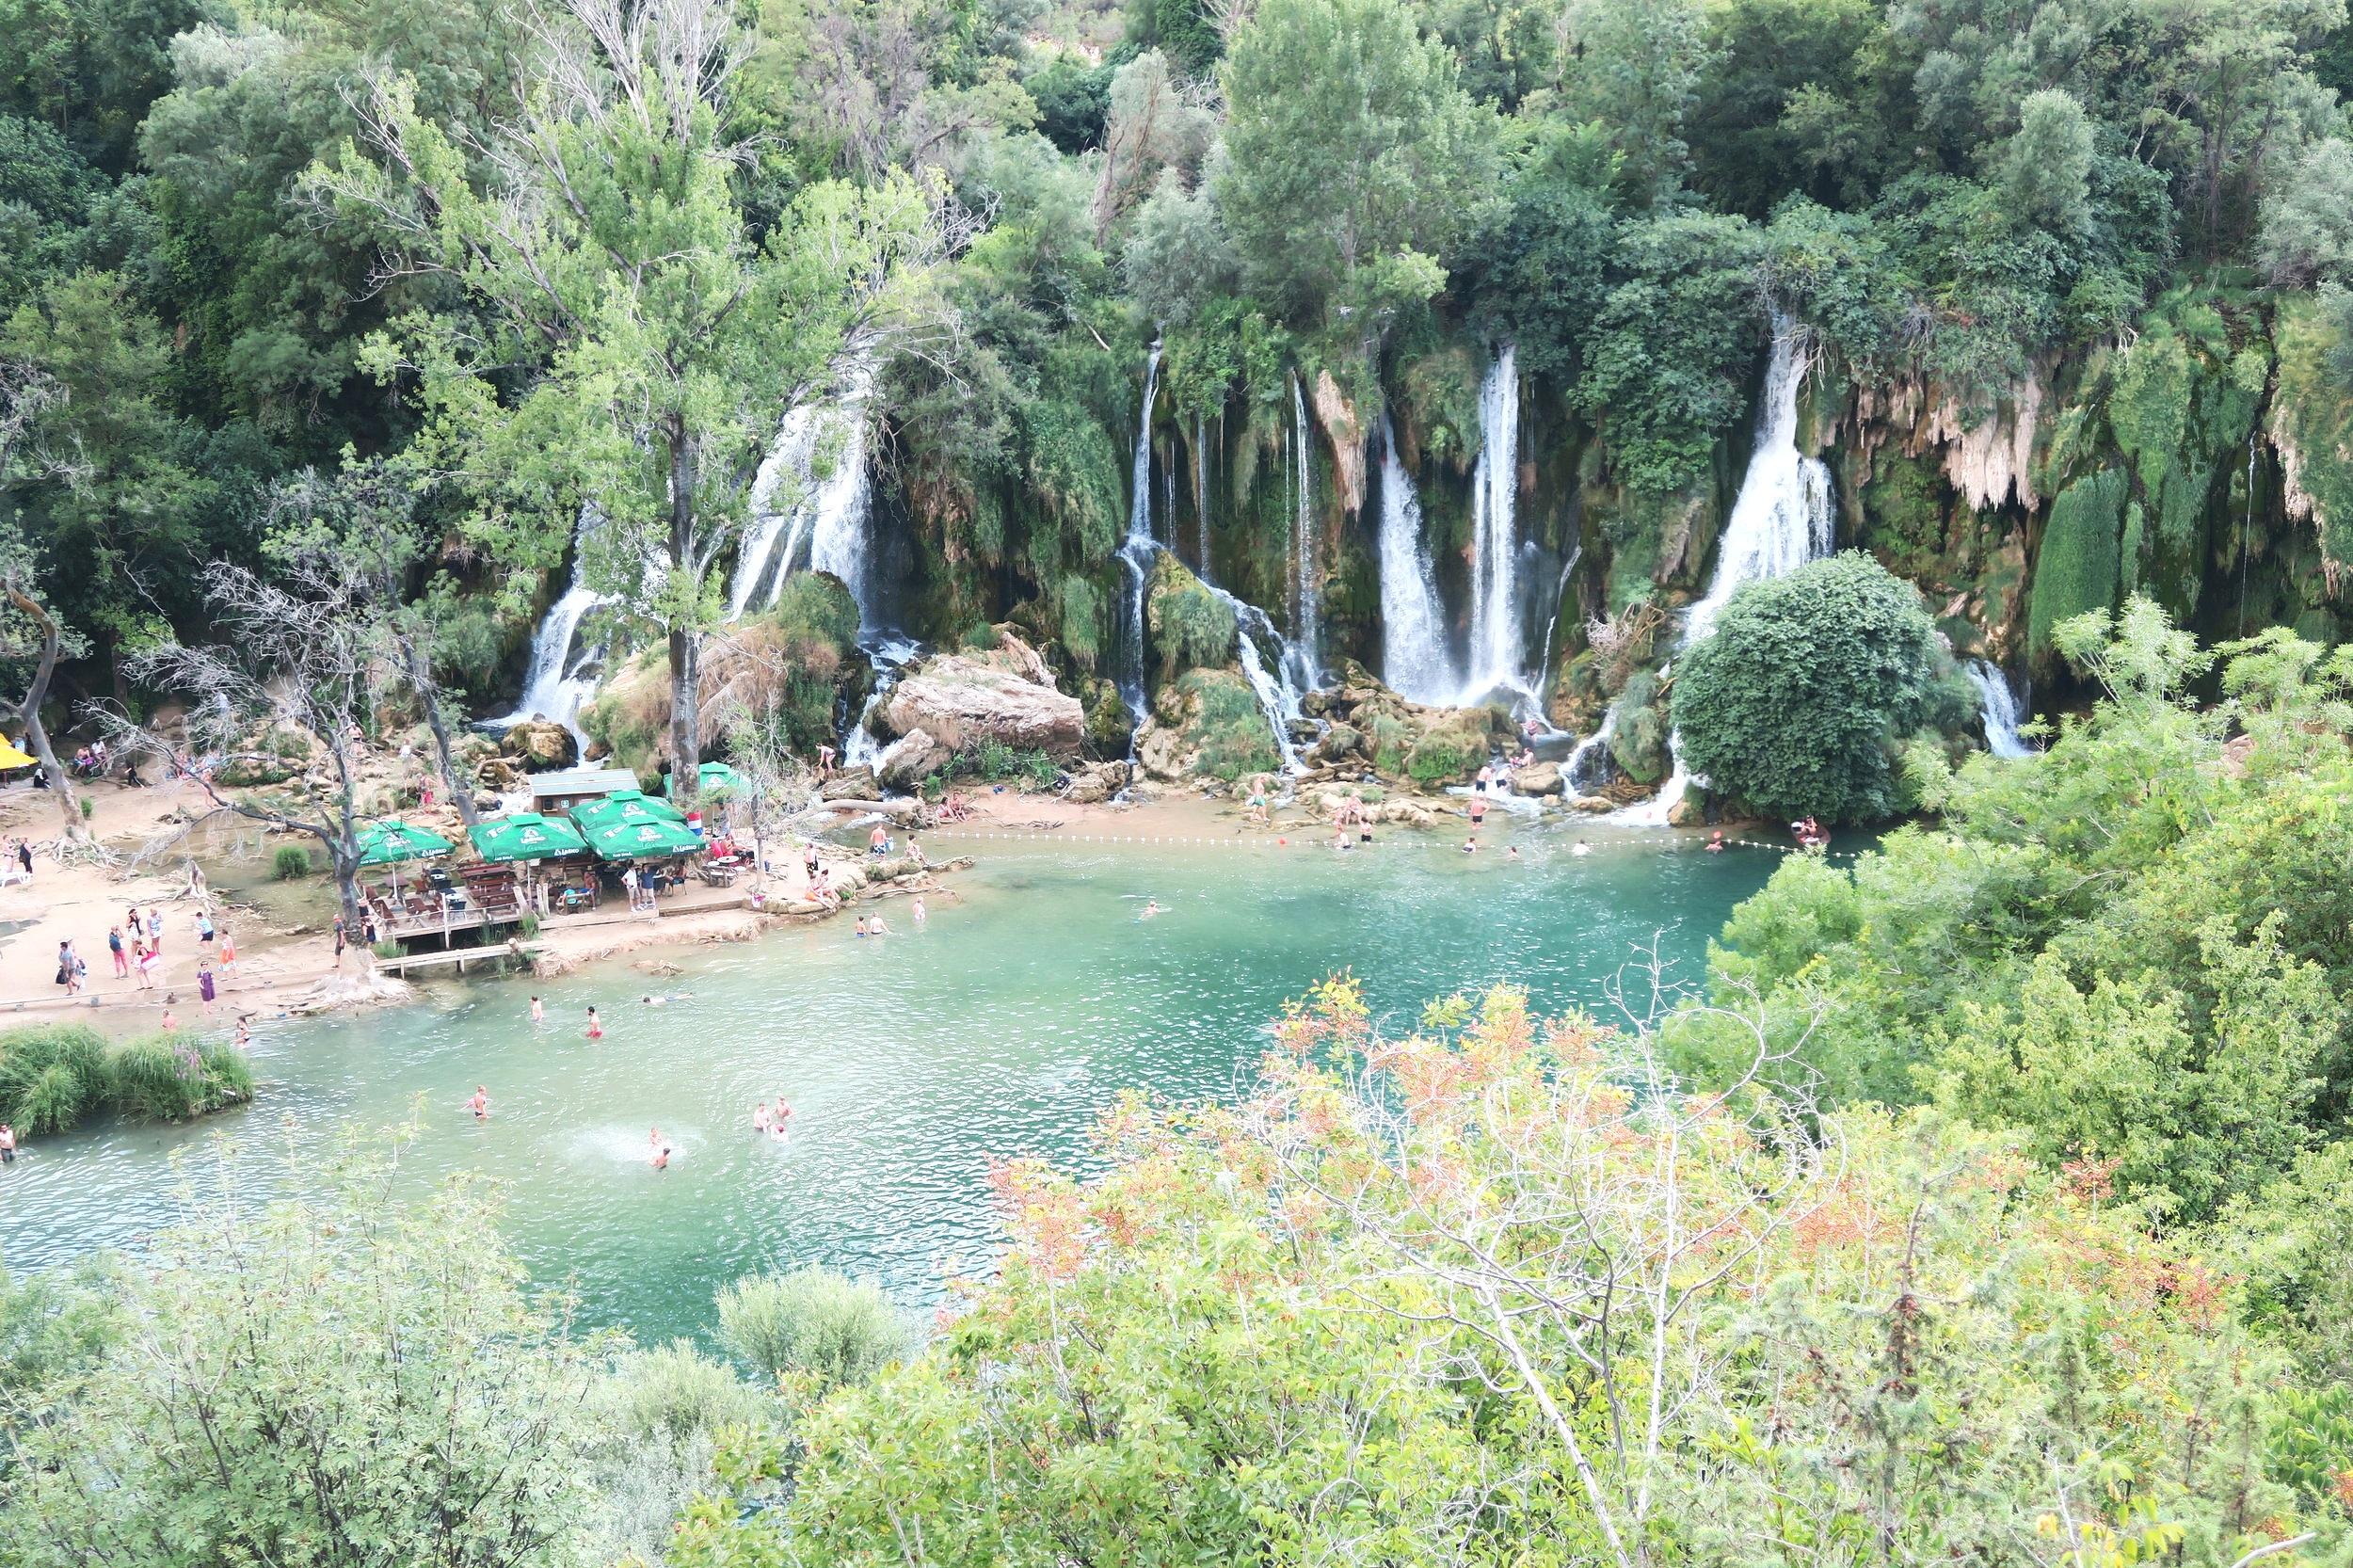 Kravice Falls in Mostar, Bosnia and Herzegovina